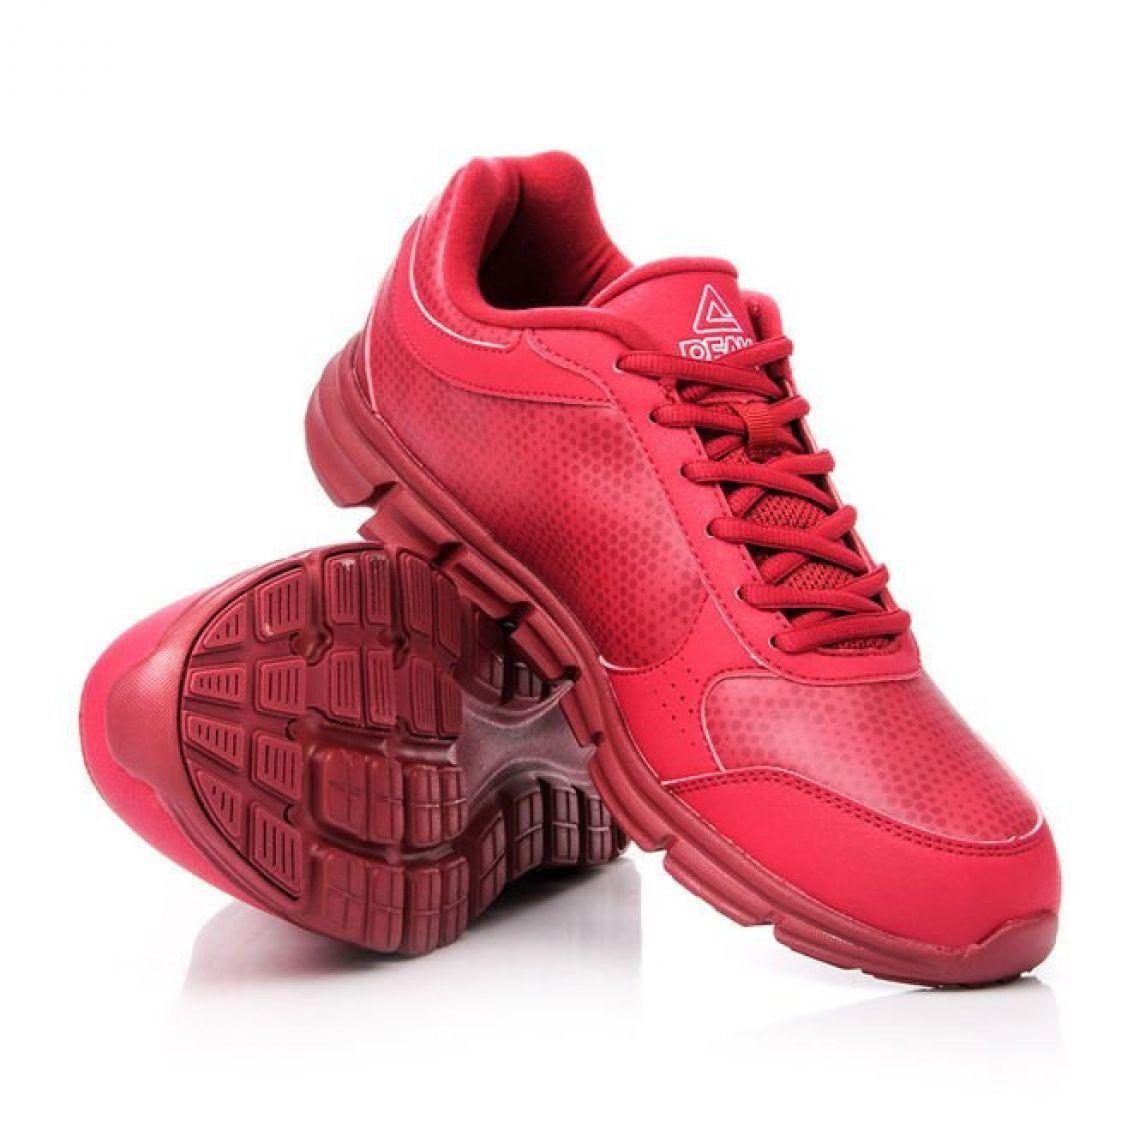 Buty Biegowe Peak E44223h M 62389 62394 Czerwone Air Max Sneakers Nike Air Max Nike Air